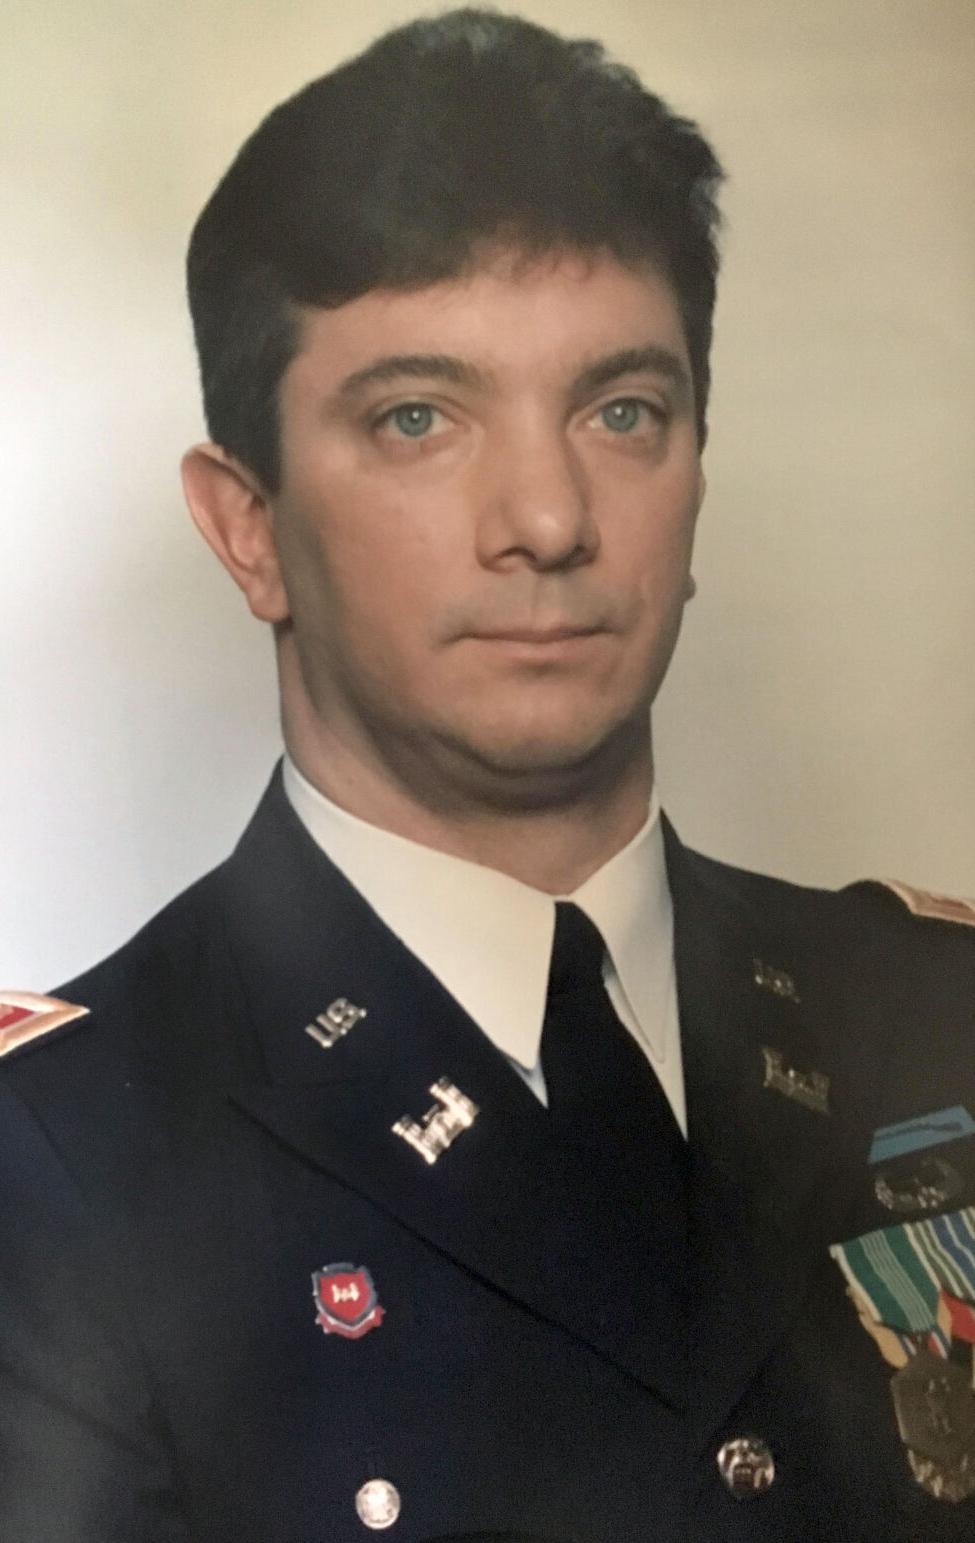 Jim Pasqualini